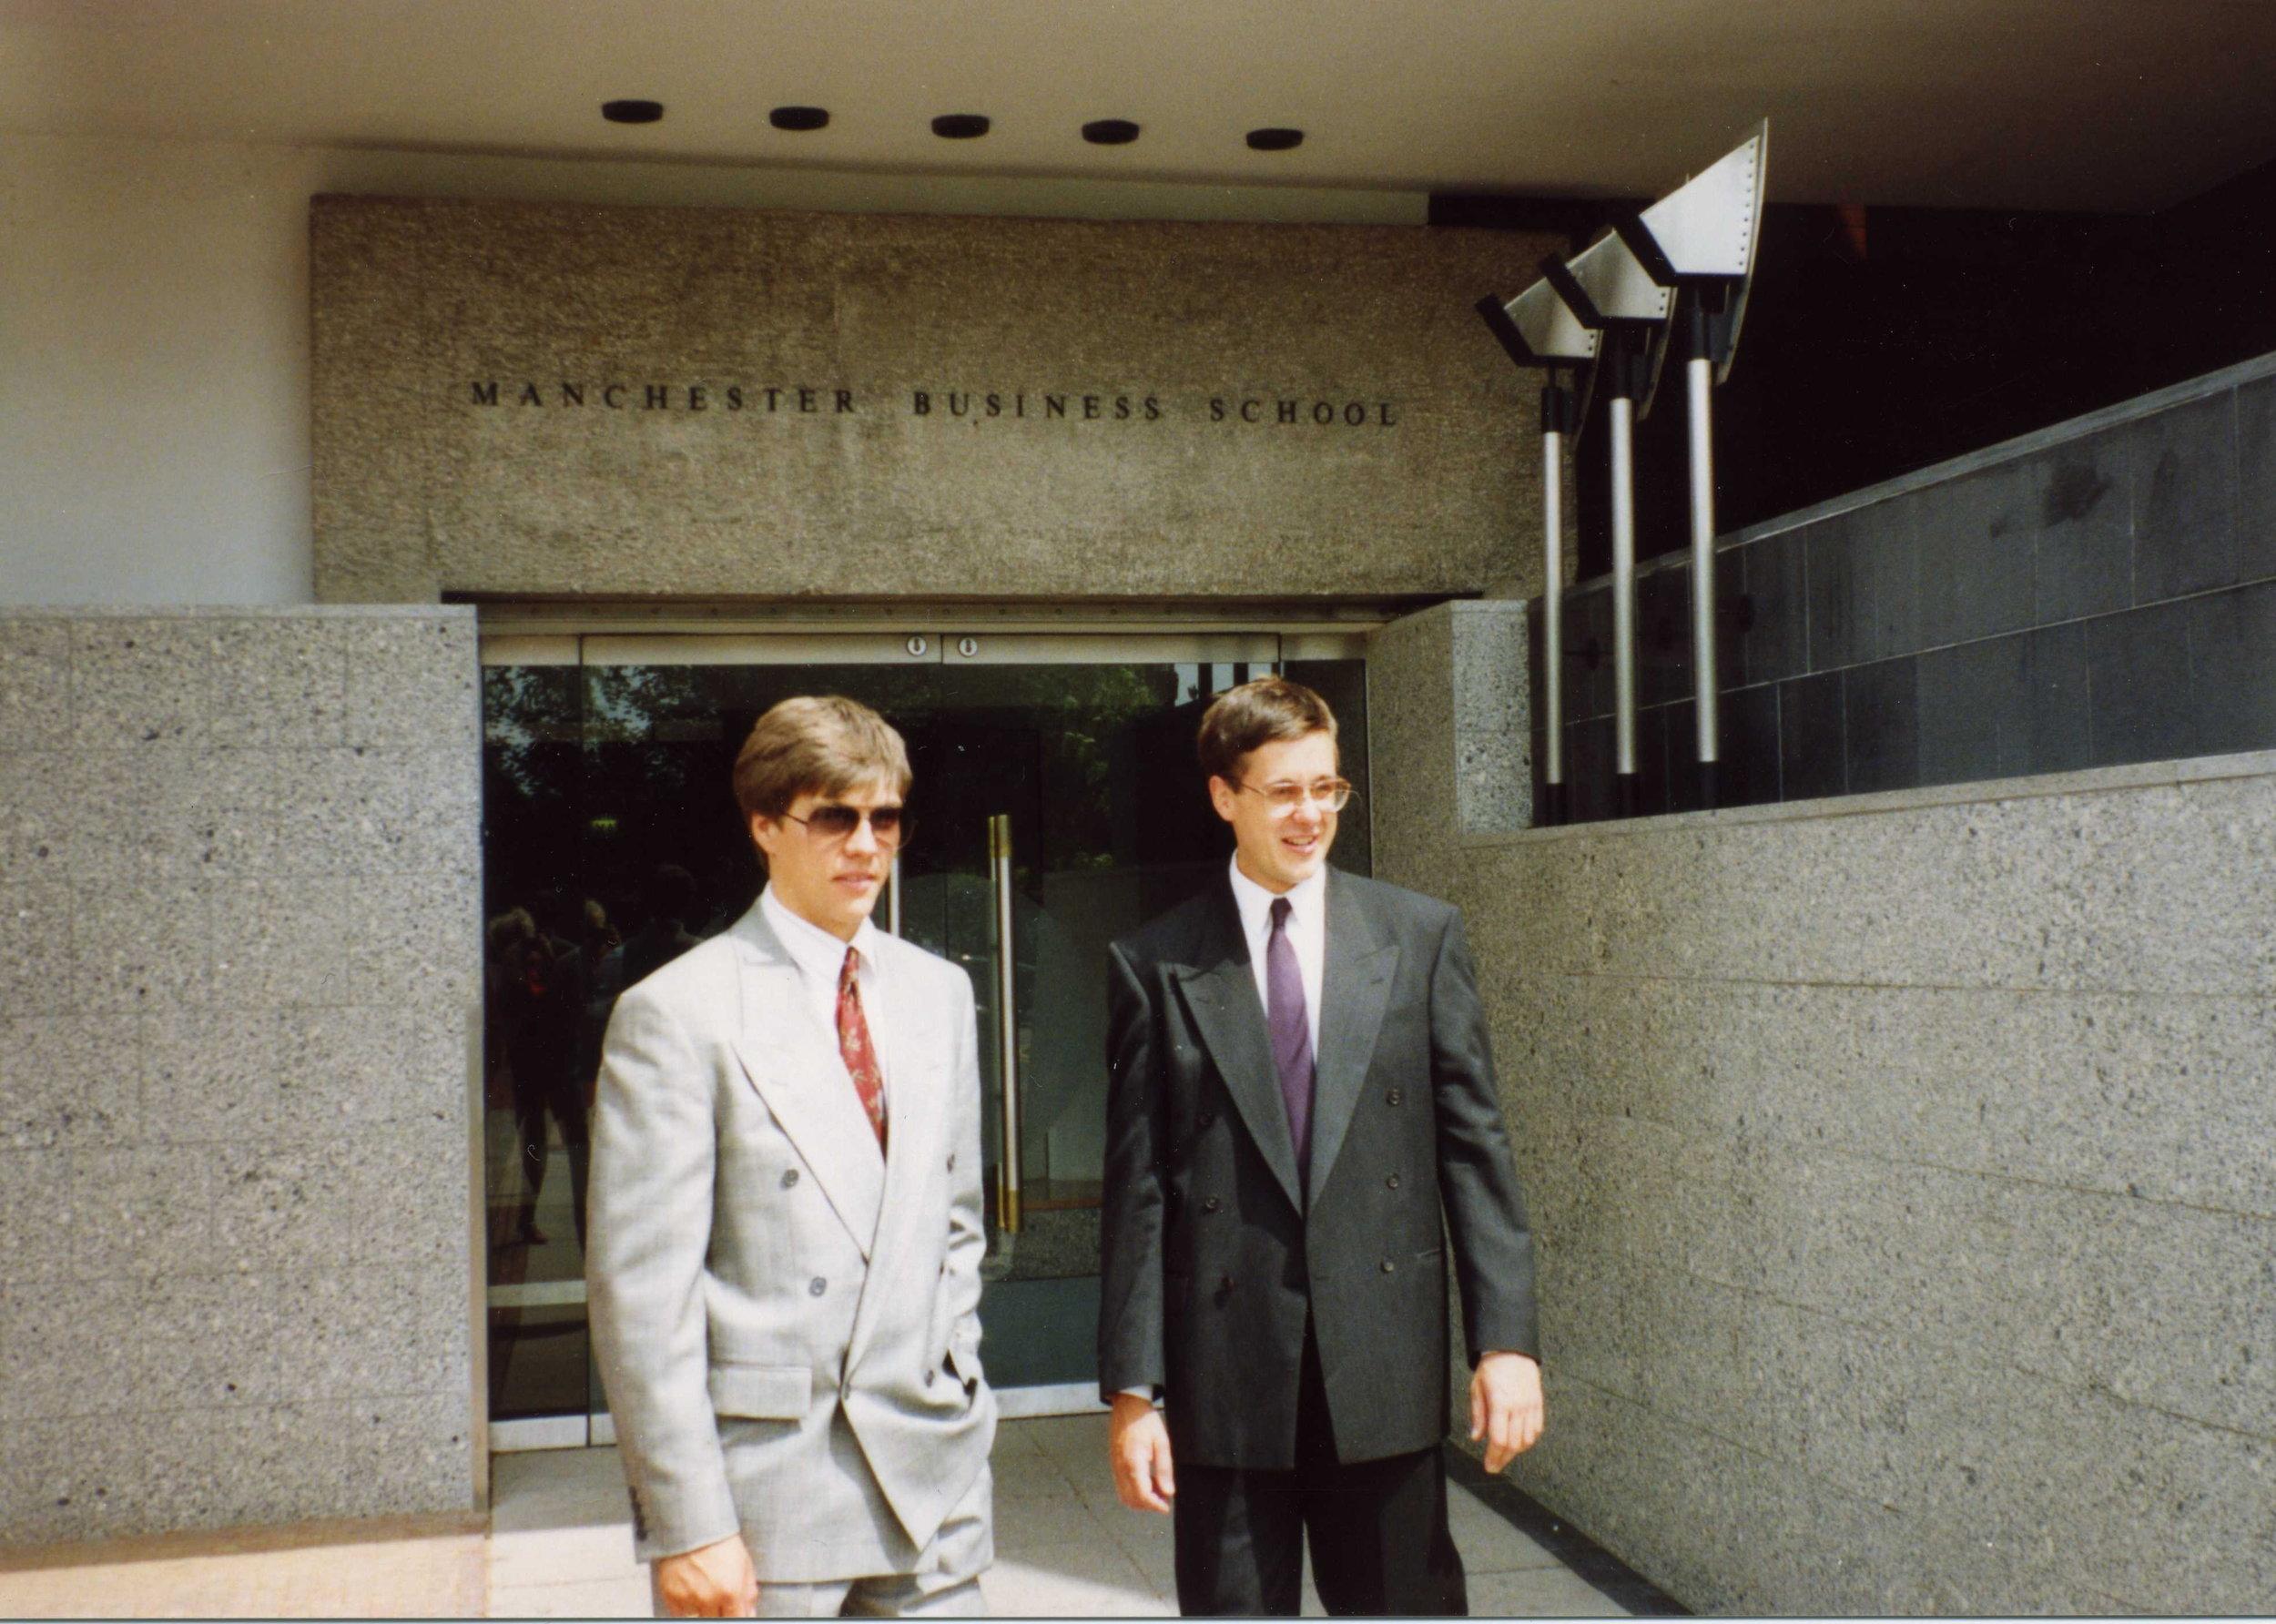 Graduation from Manchester Business School, 1991